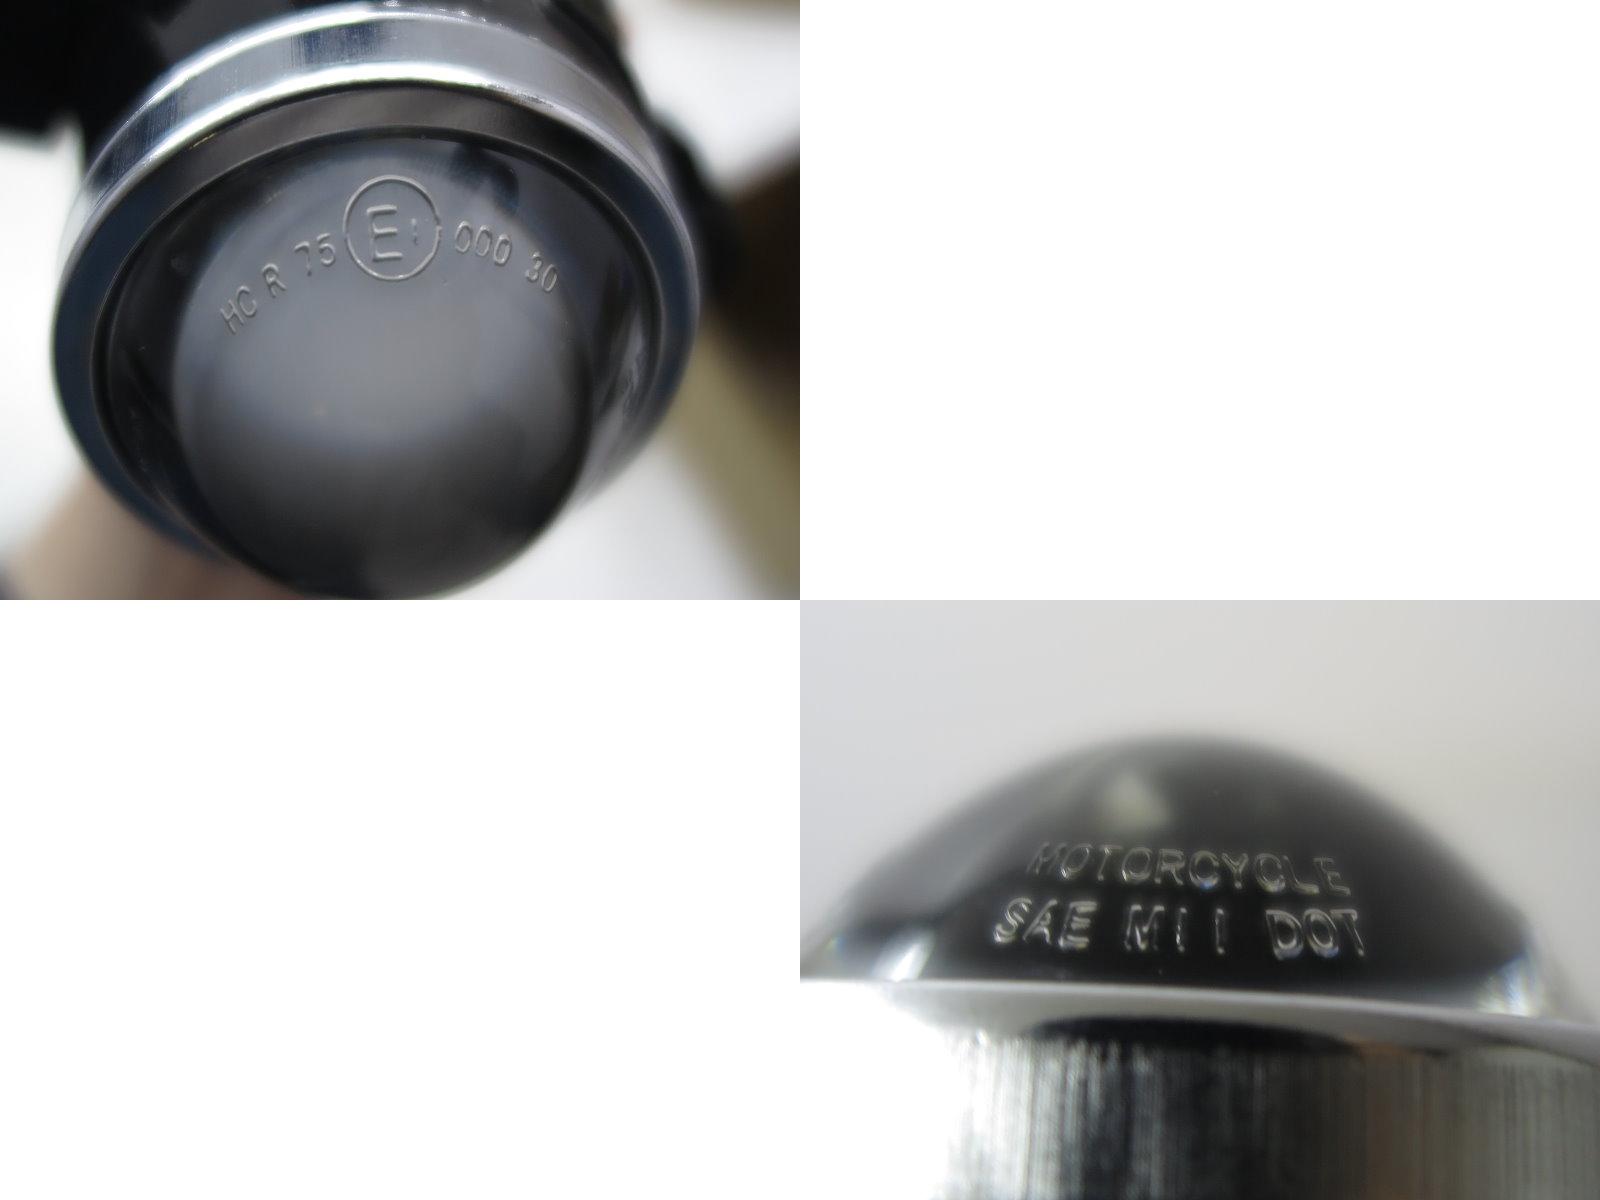 thumbnail 6 - NV400 2010-Present VAN 2D Projector Fog Light Black for NISSAN